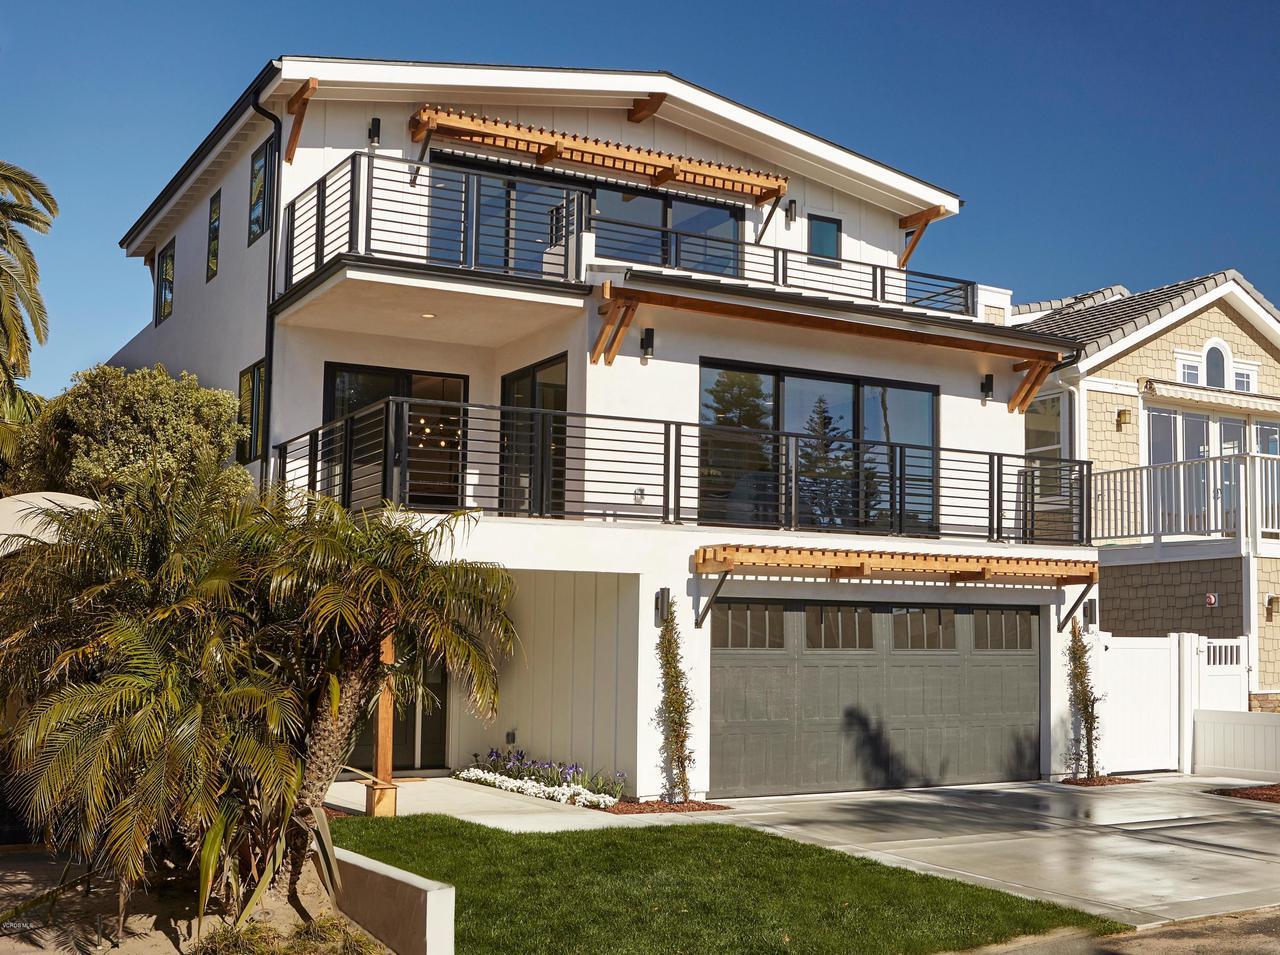 Photo of 1193 KINGSTON LANE, Ventura, CA 93001